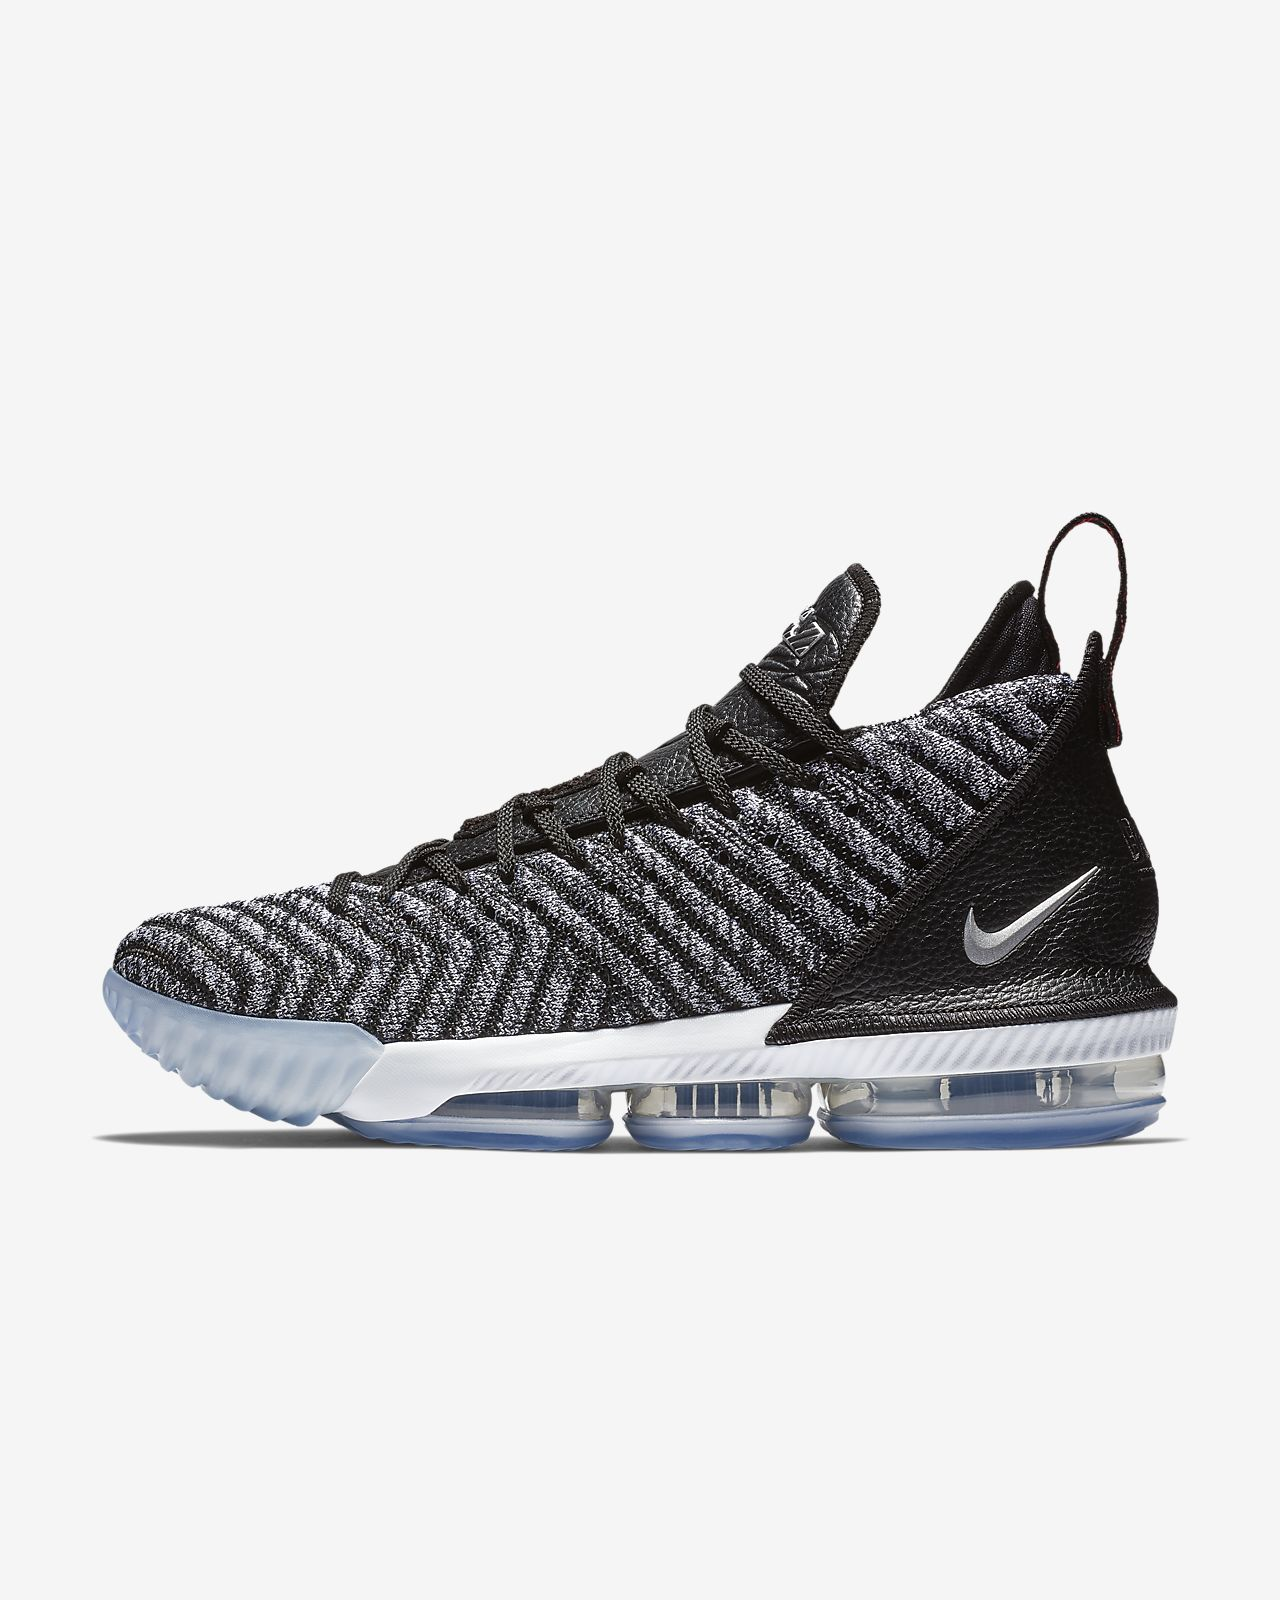 9607a67b8d030 LeBron 16 Zapatillas de baloncesto. Nike.com ES